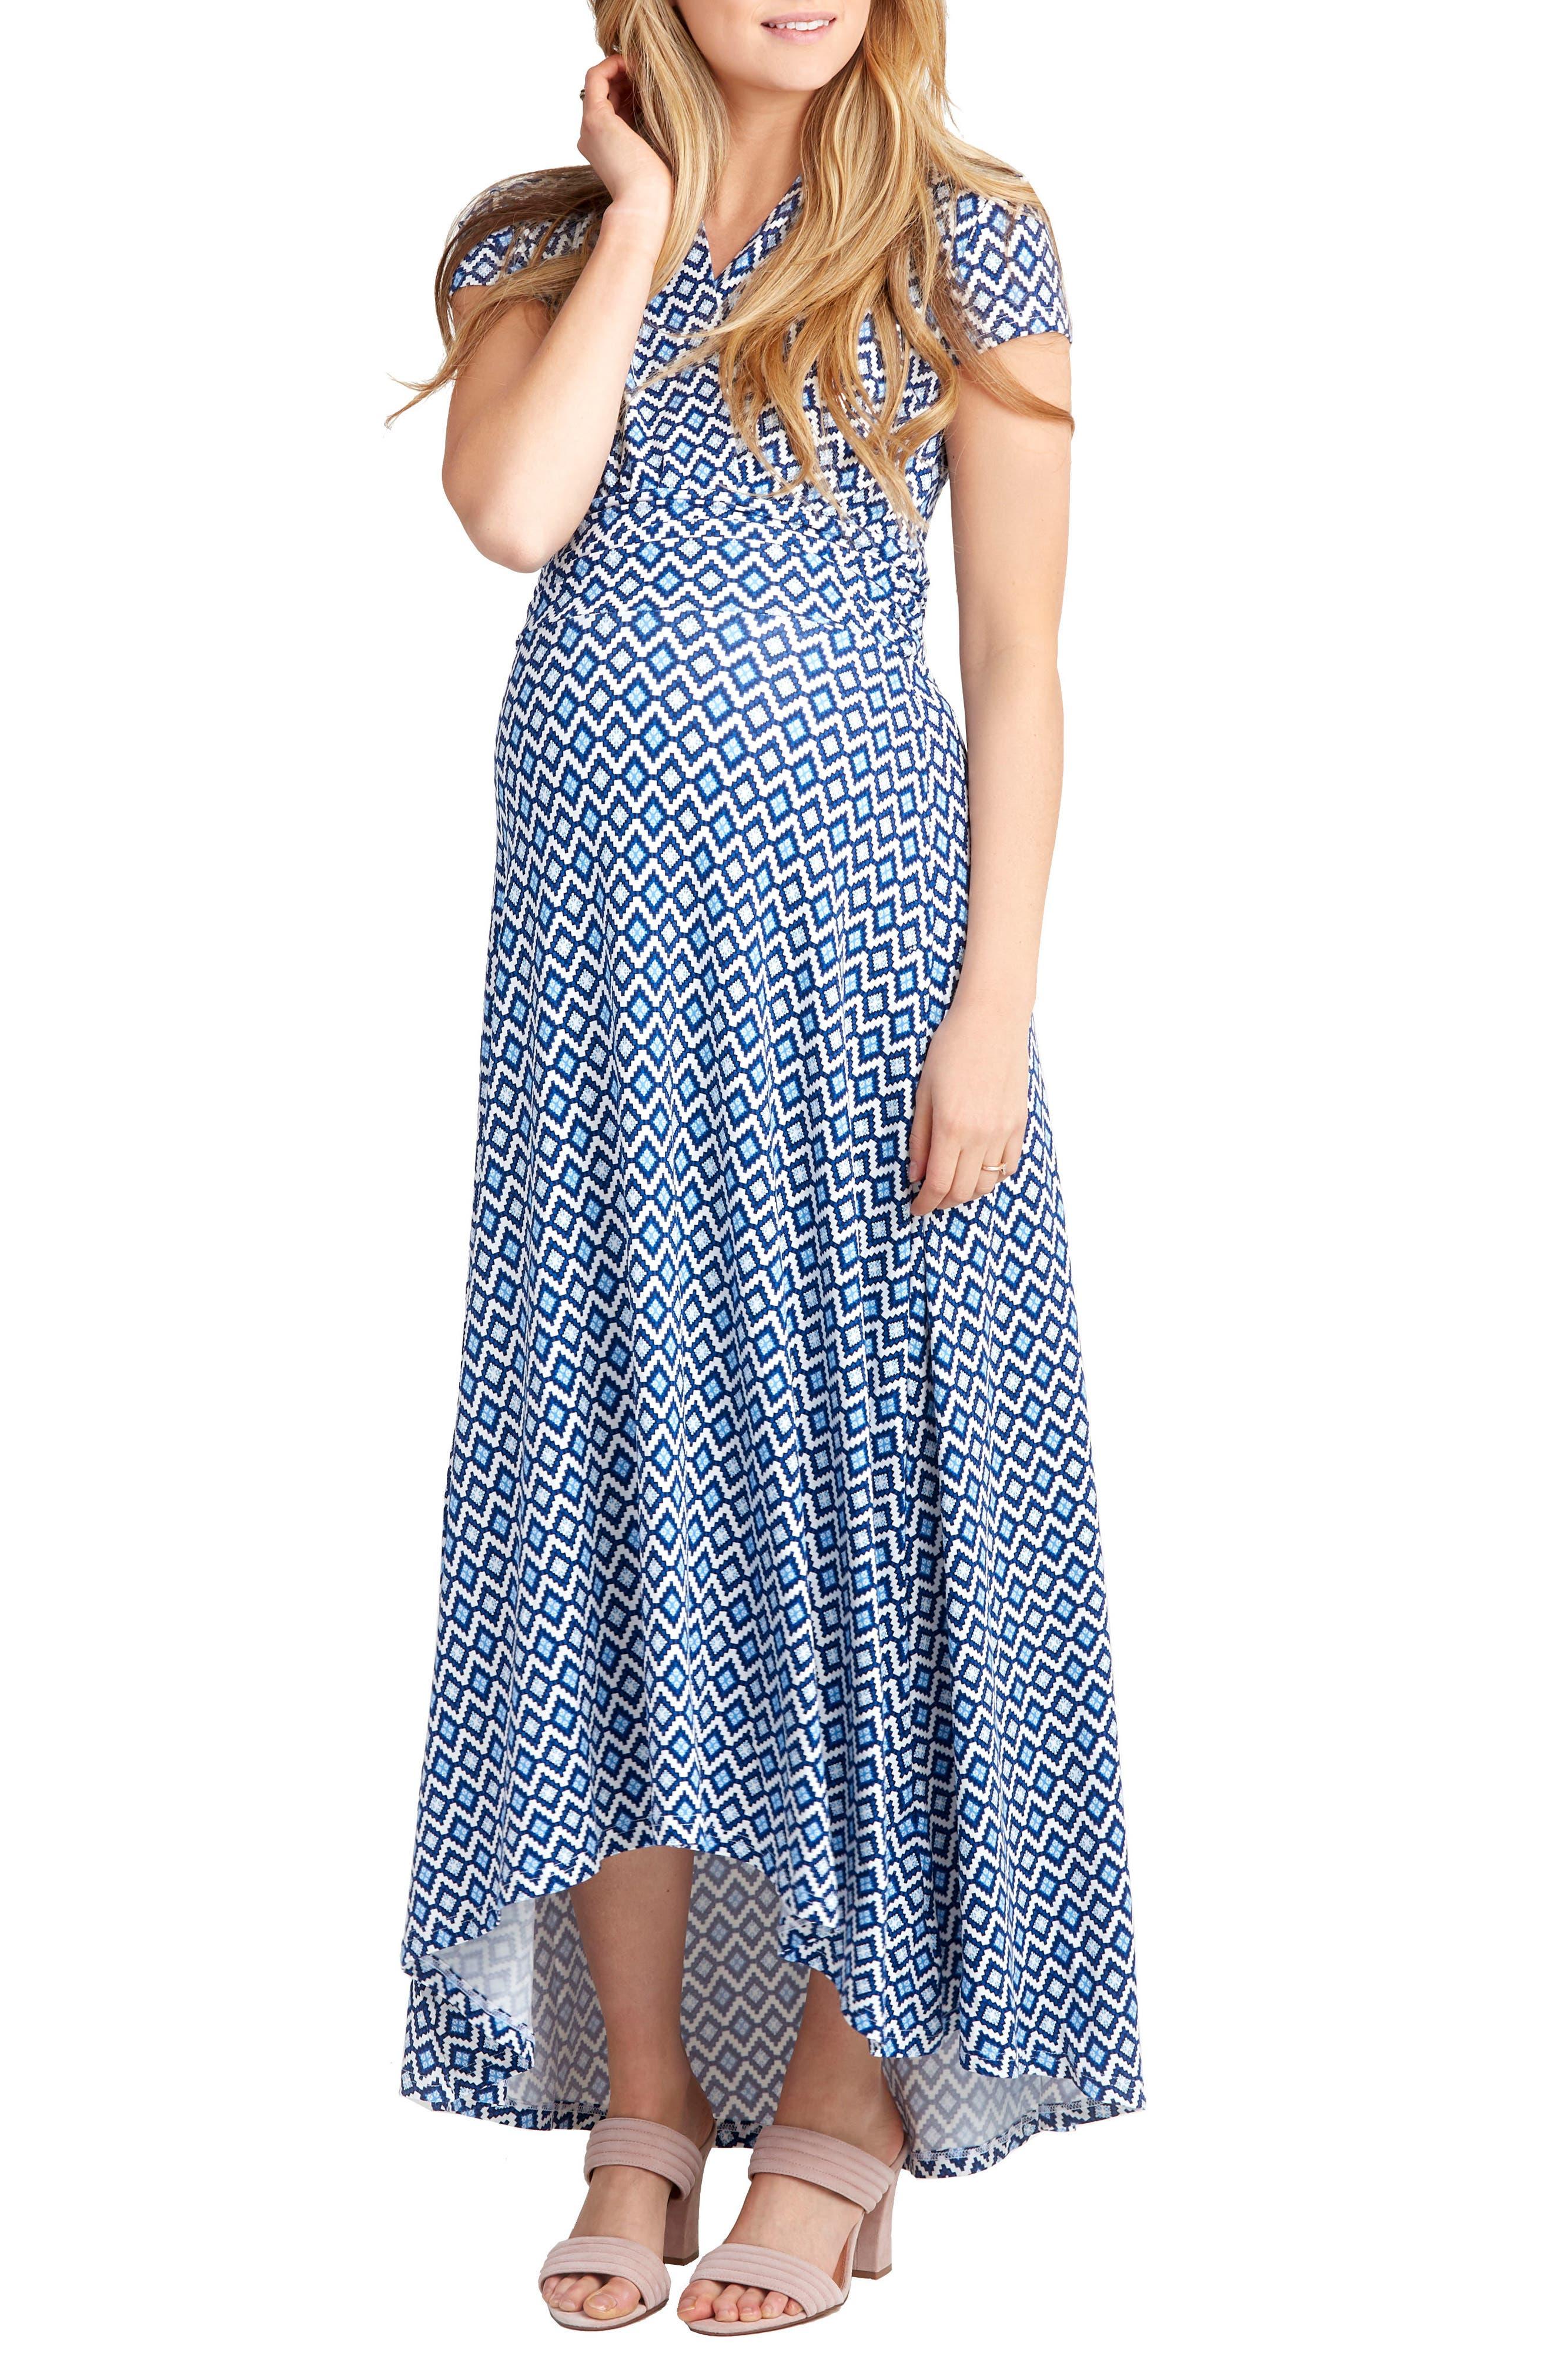 Main Image - Nom Maternity 'Caroline' Maternity/Nursing Maxi Dress